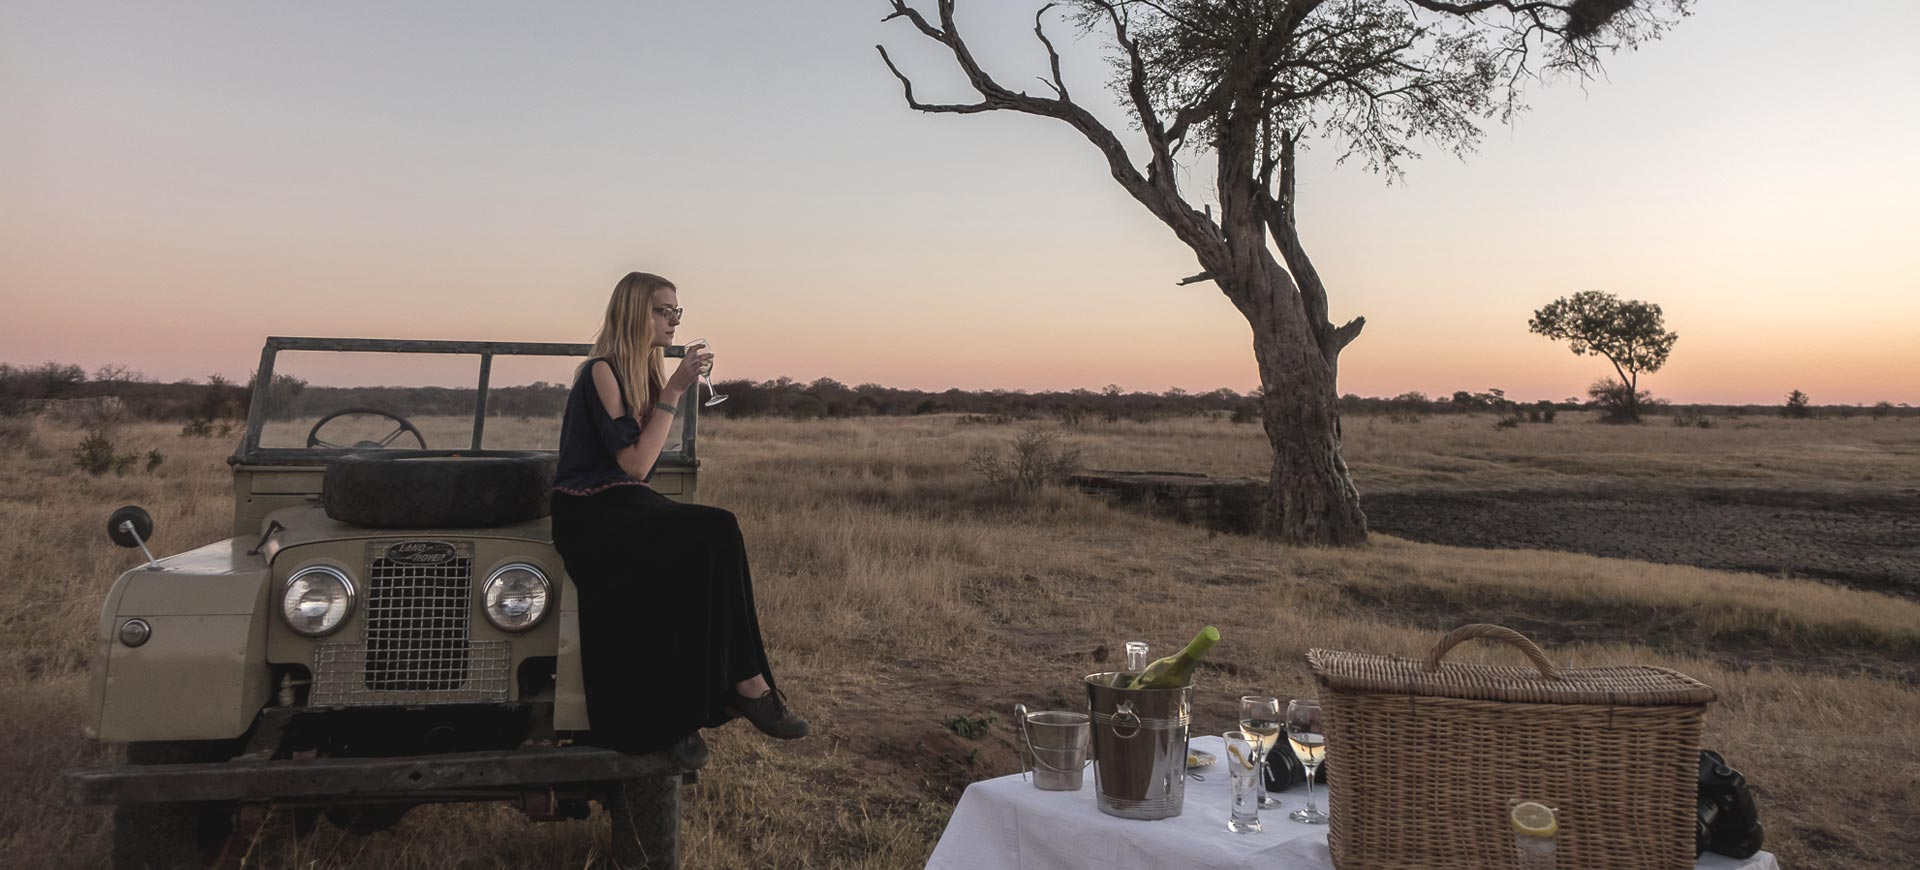 Female Adventure Travel To Africa